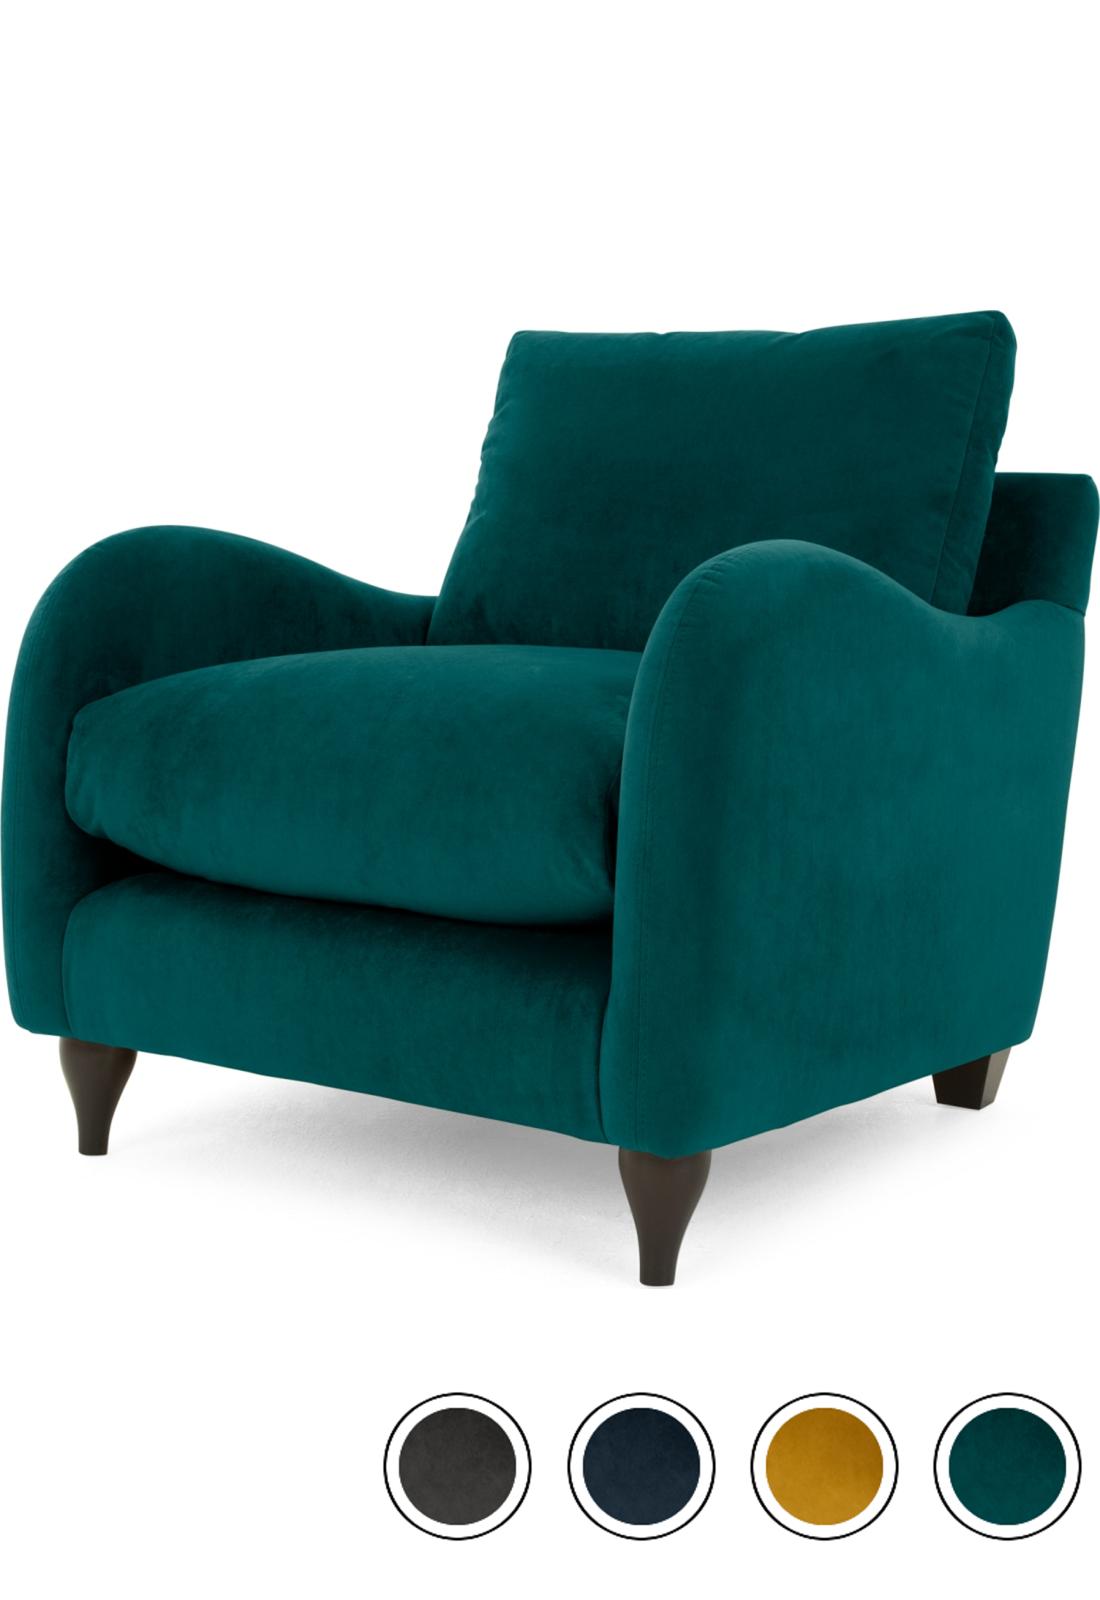 MADE Plush Mallard Velvet Armchair | Armchair, Teal ...